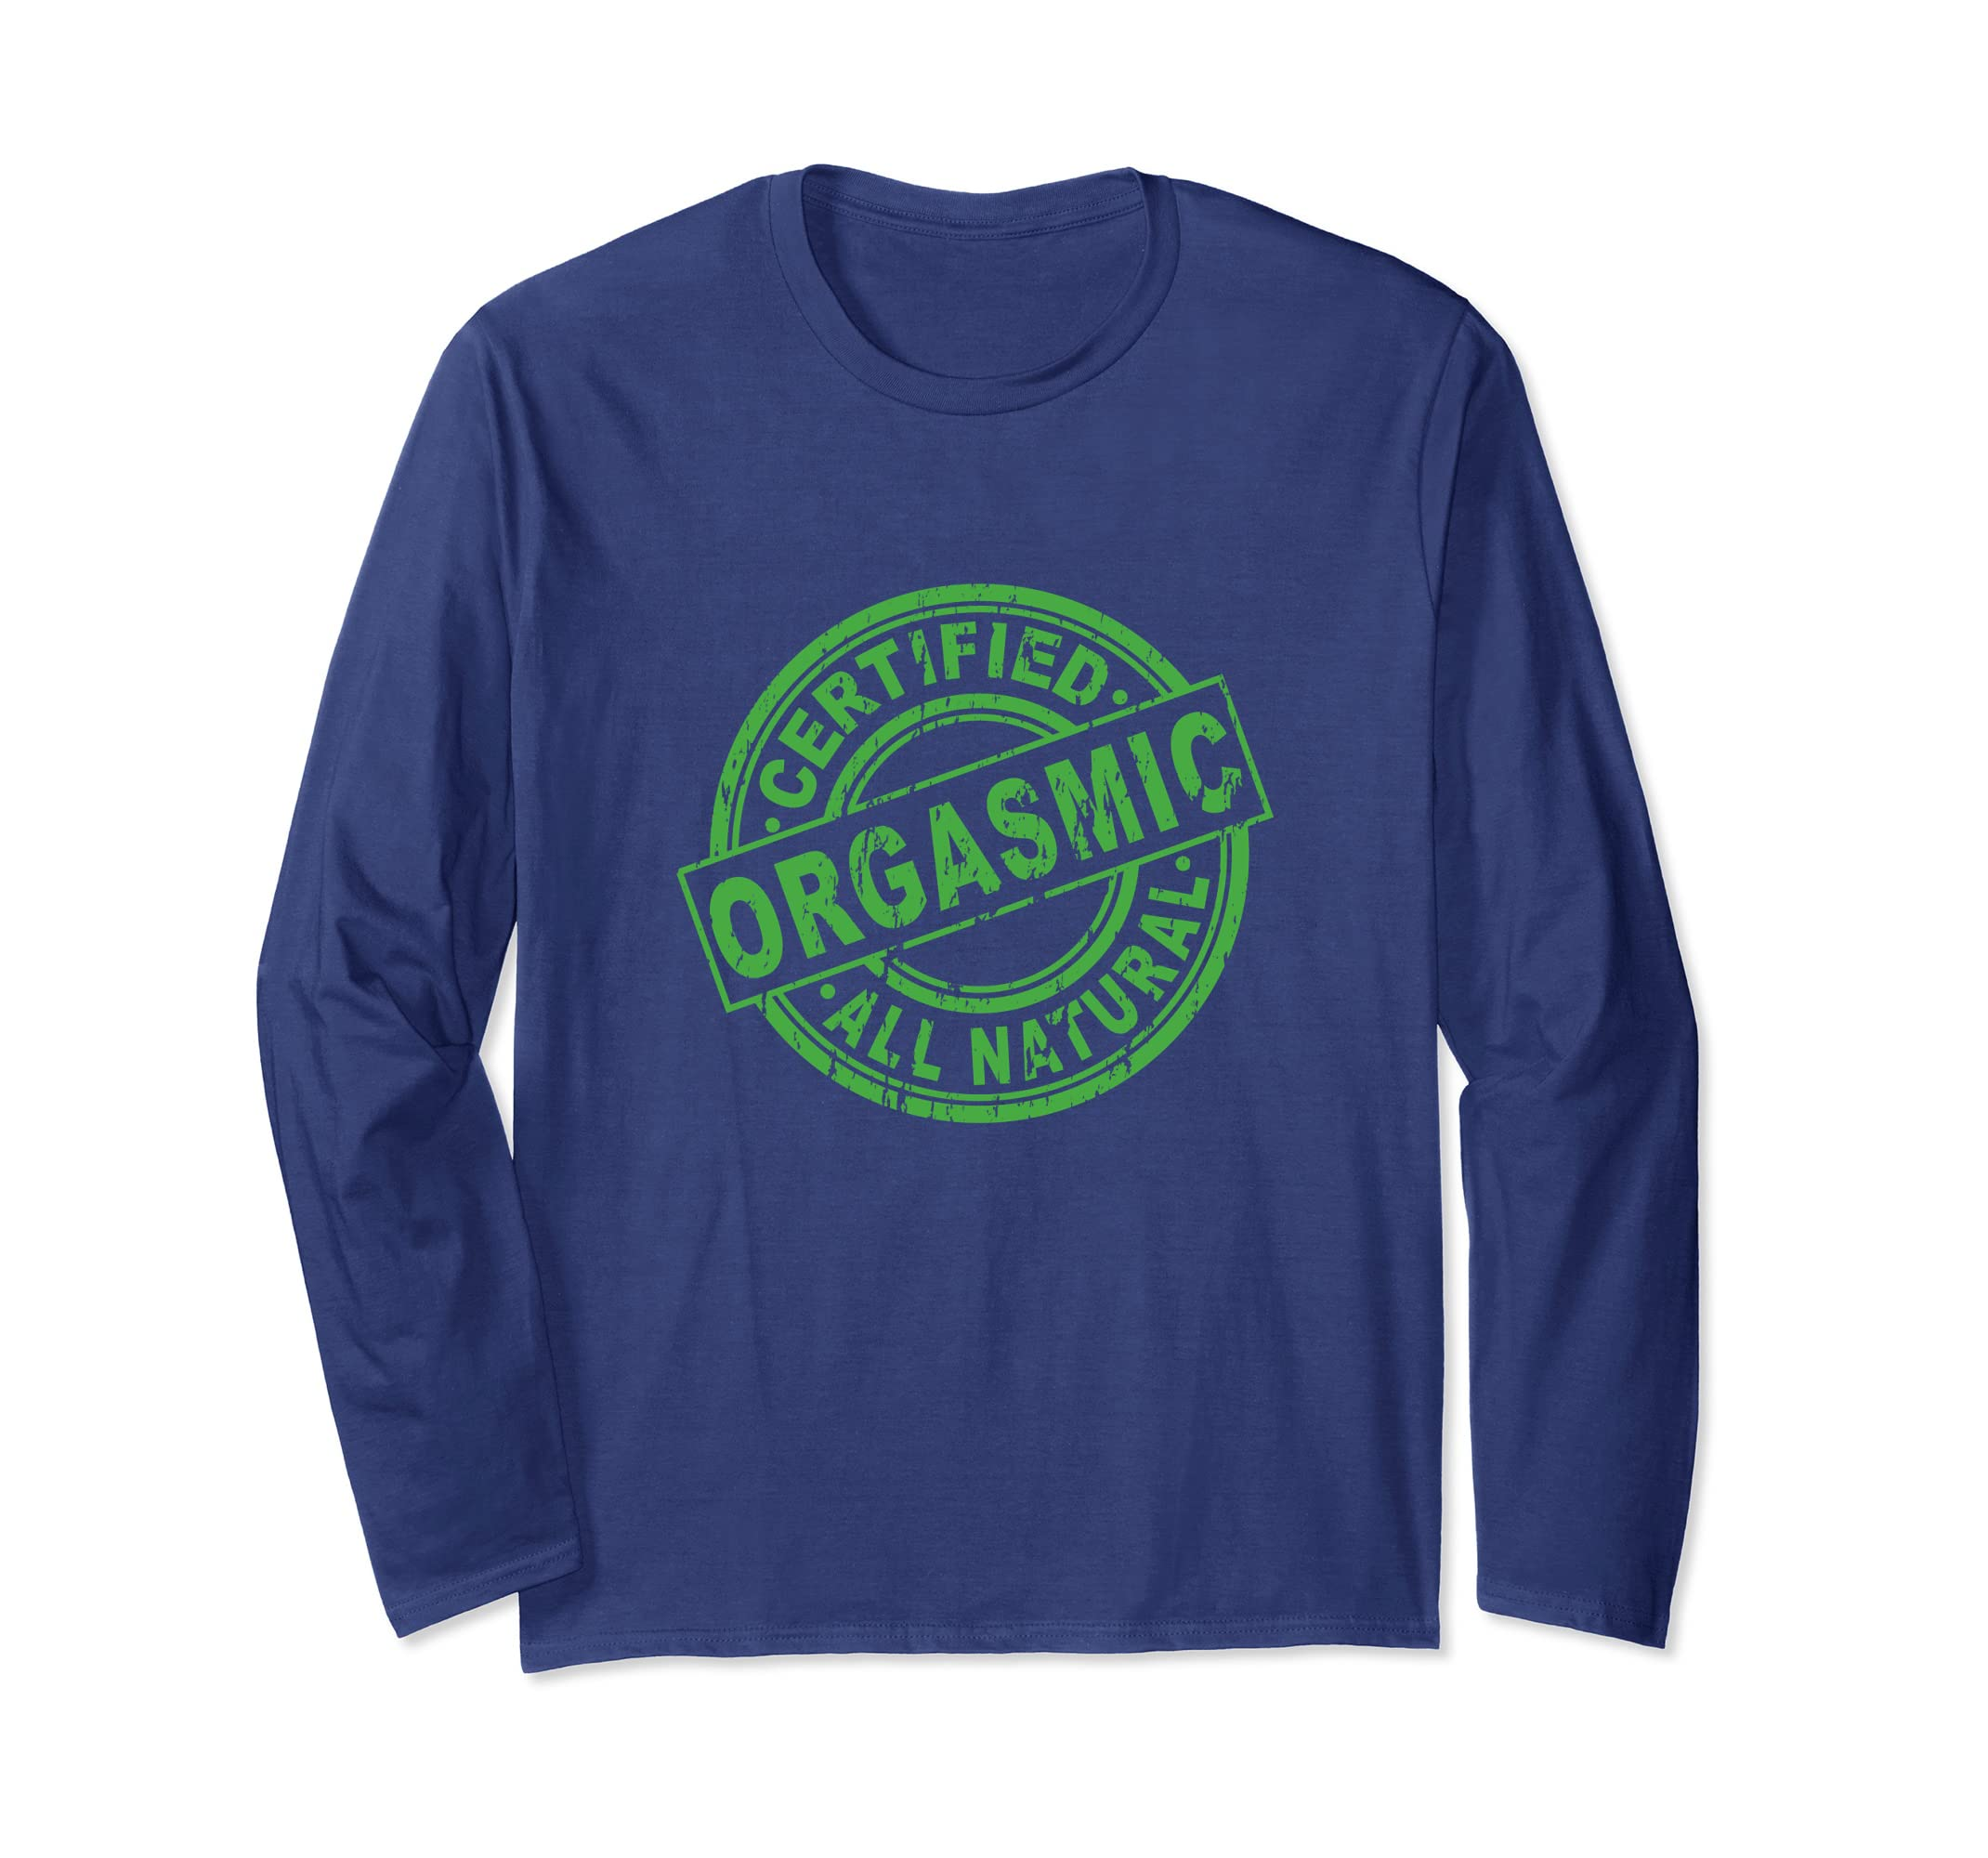 Orgasmic Certified Long Sleeve T Shirt by LEG A C